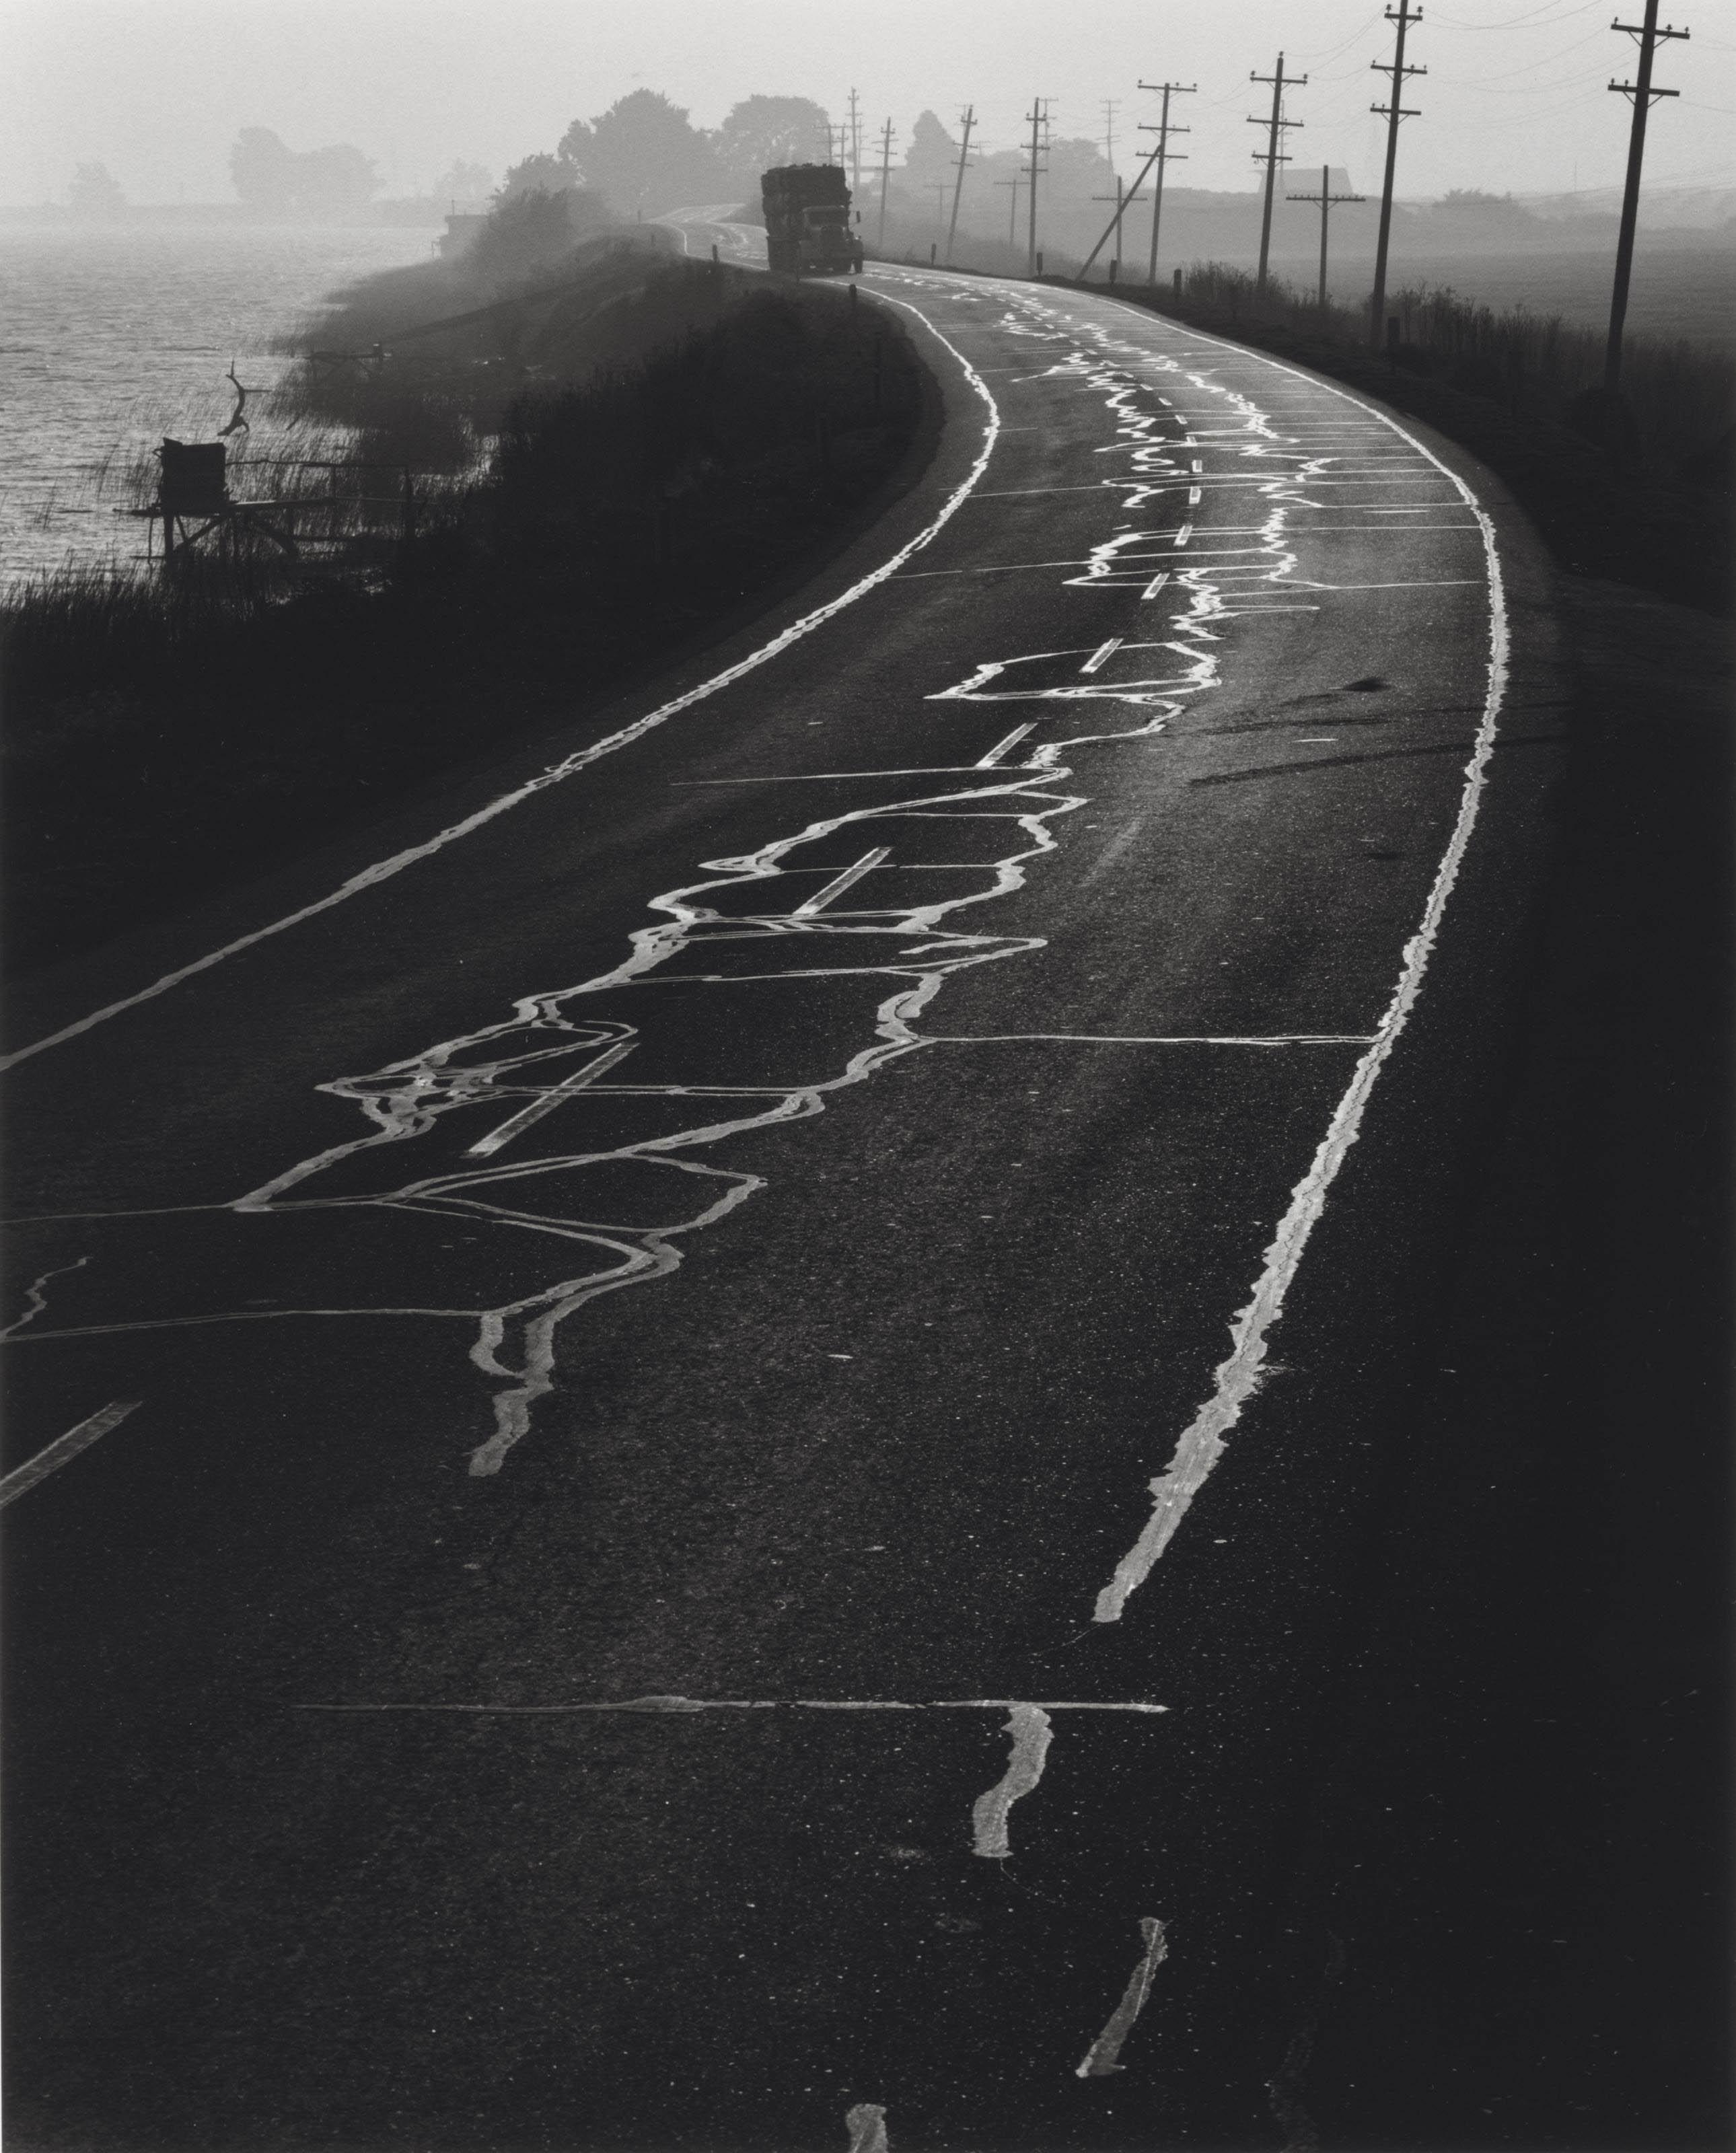 Untitled, 1968; and Sacramento, San Joaquin River Delta, 1967